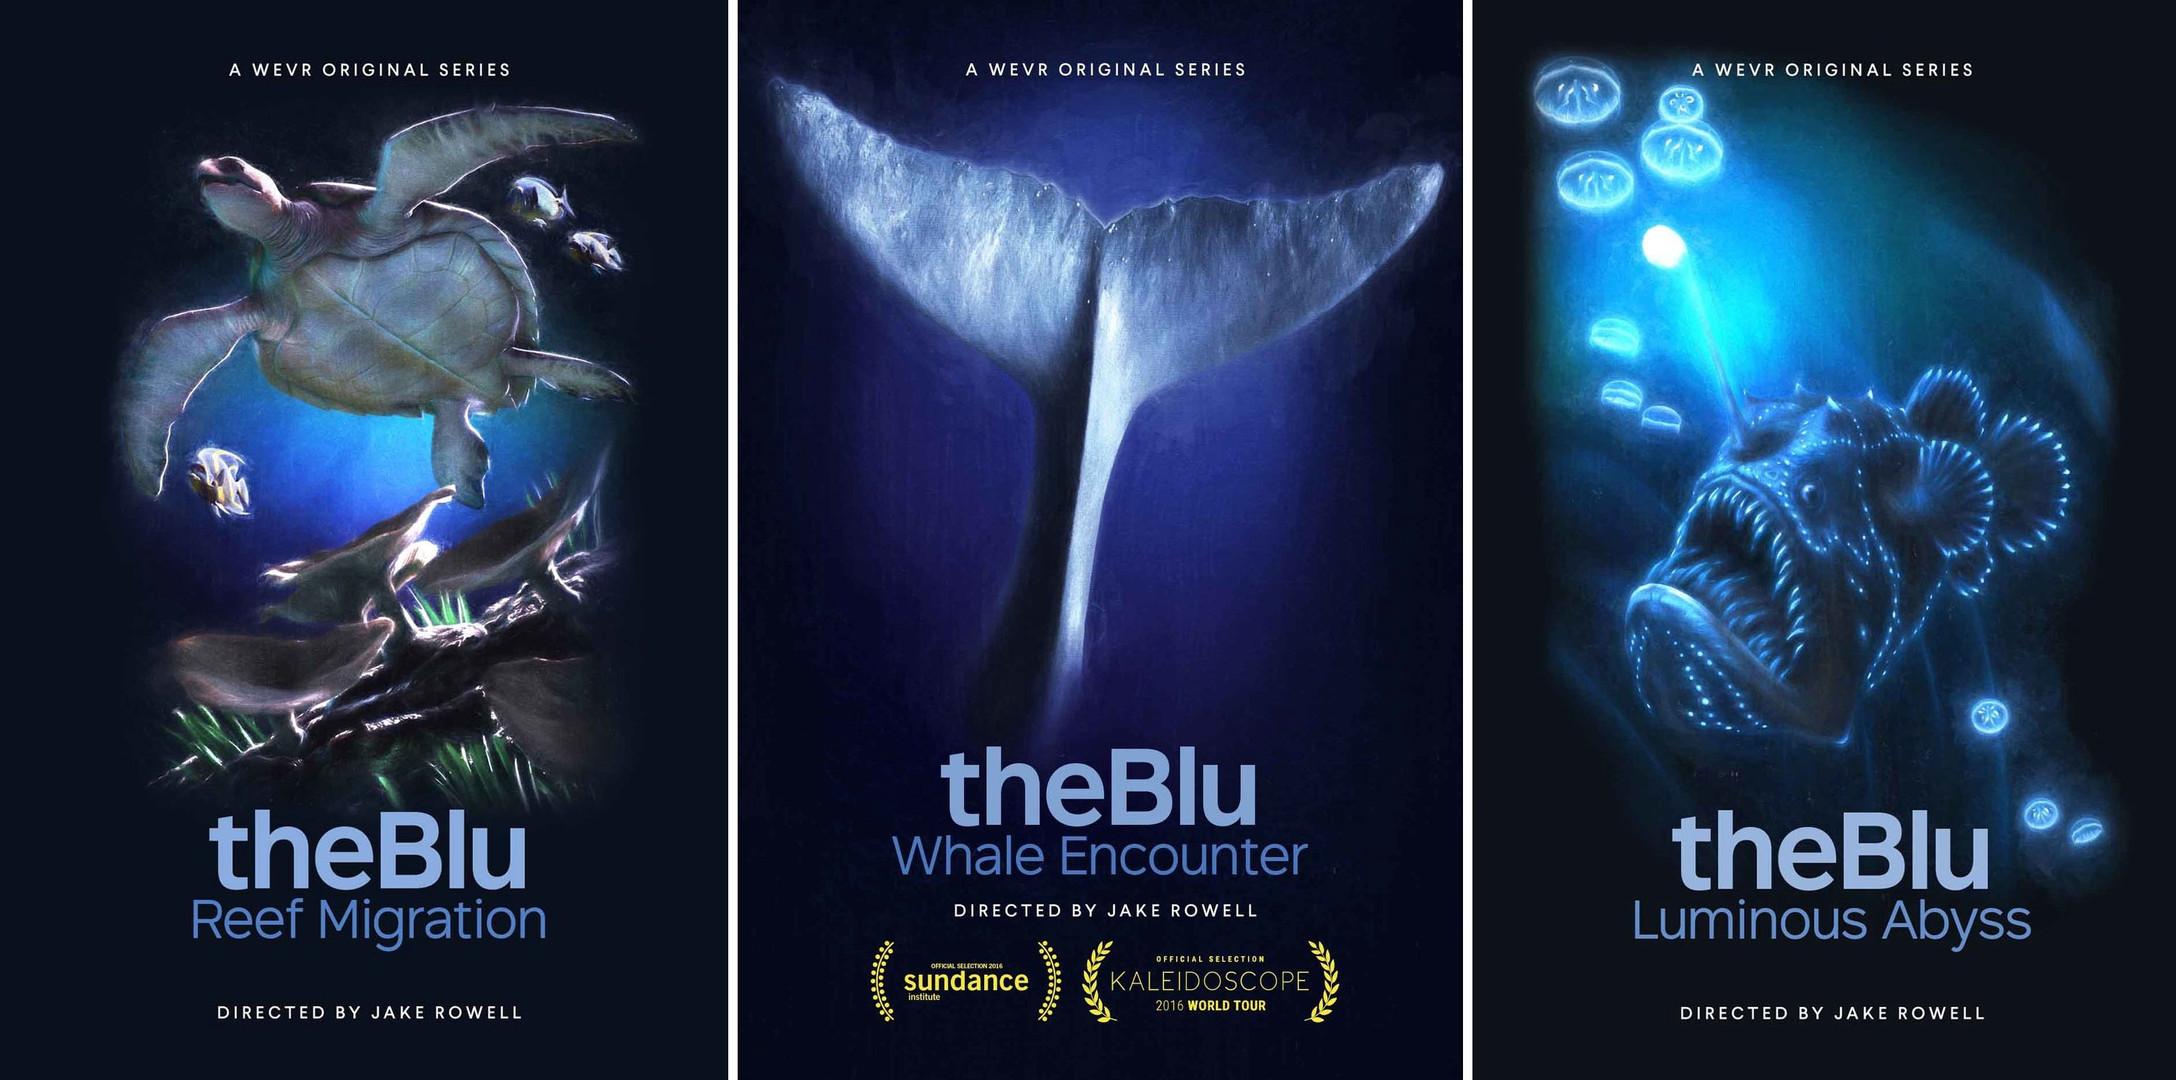 the blu vr.jpeg